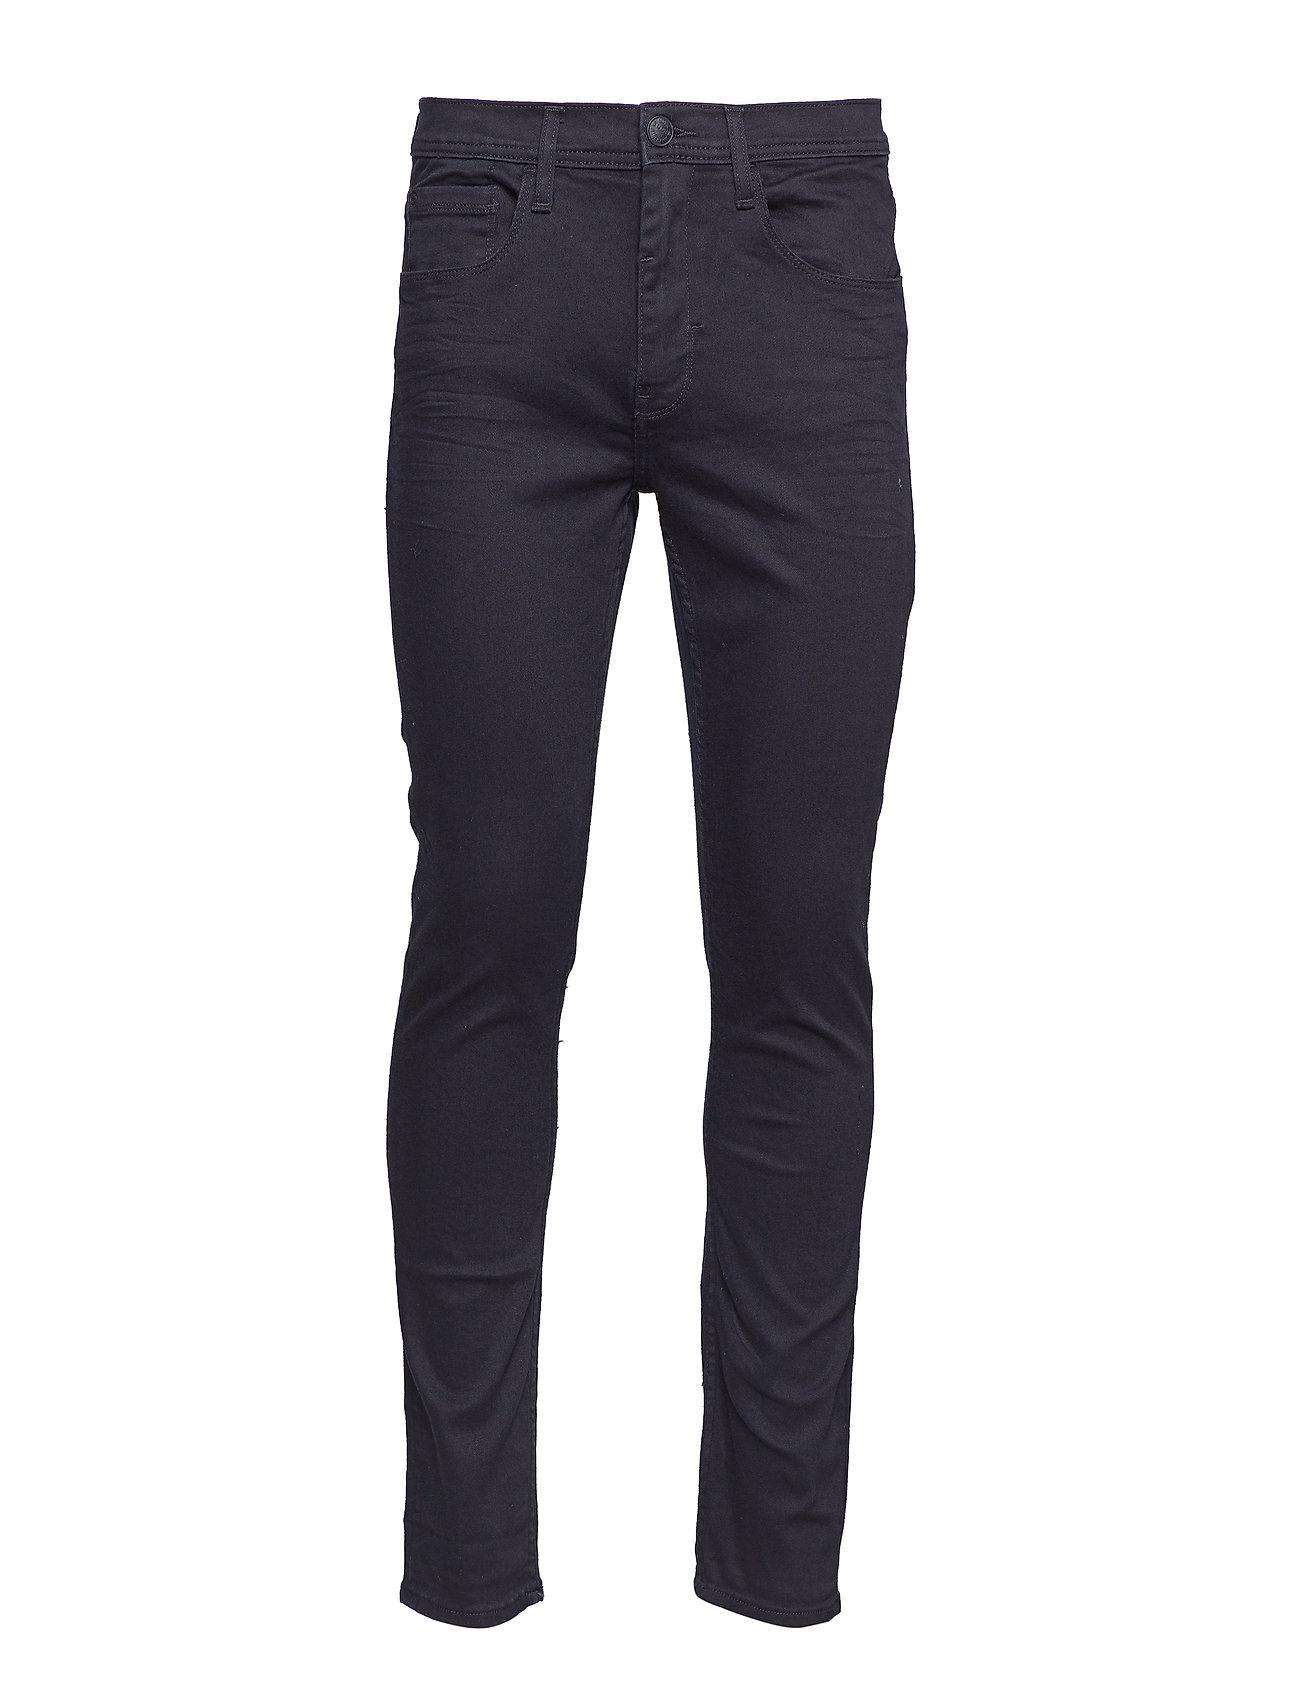 Blend Jeans w. multiflex - NOOS - DENIM BLACK